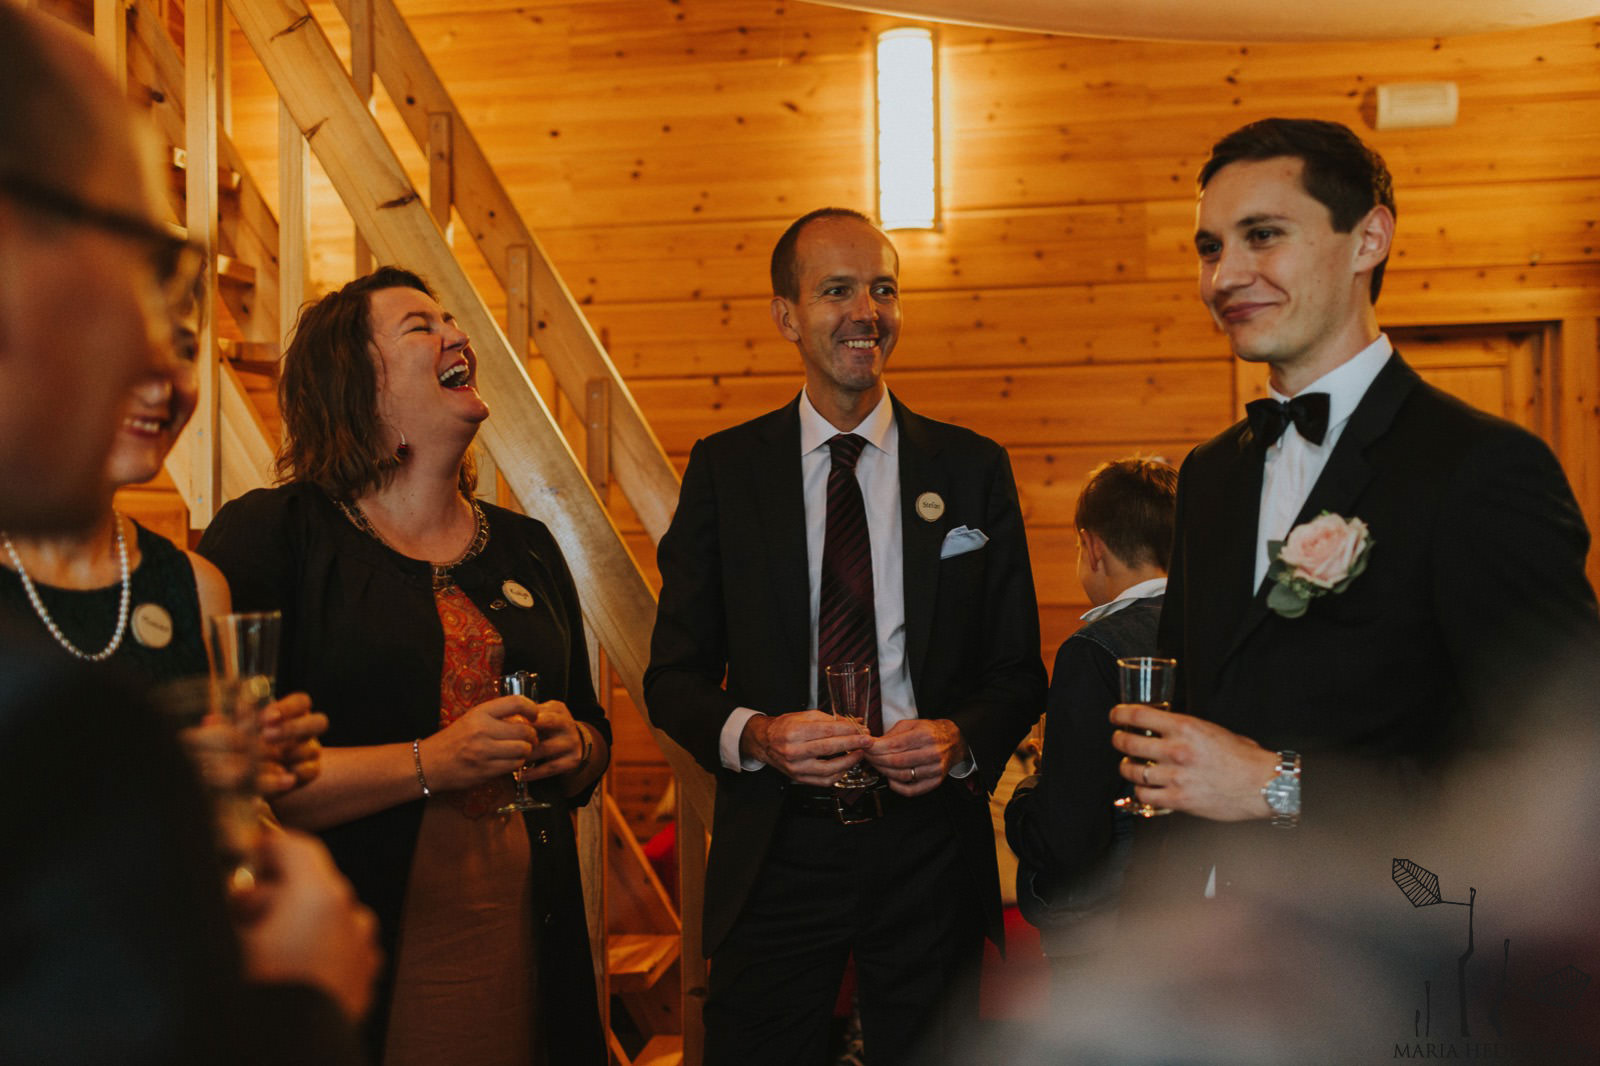 Russian wedding guests